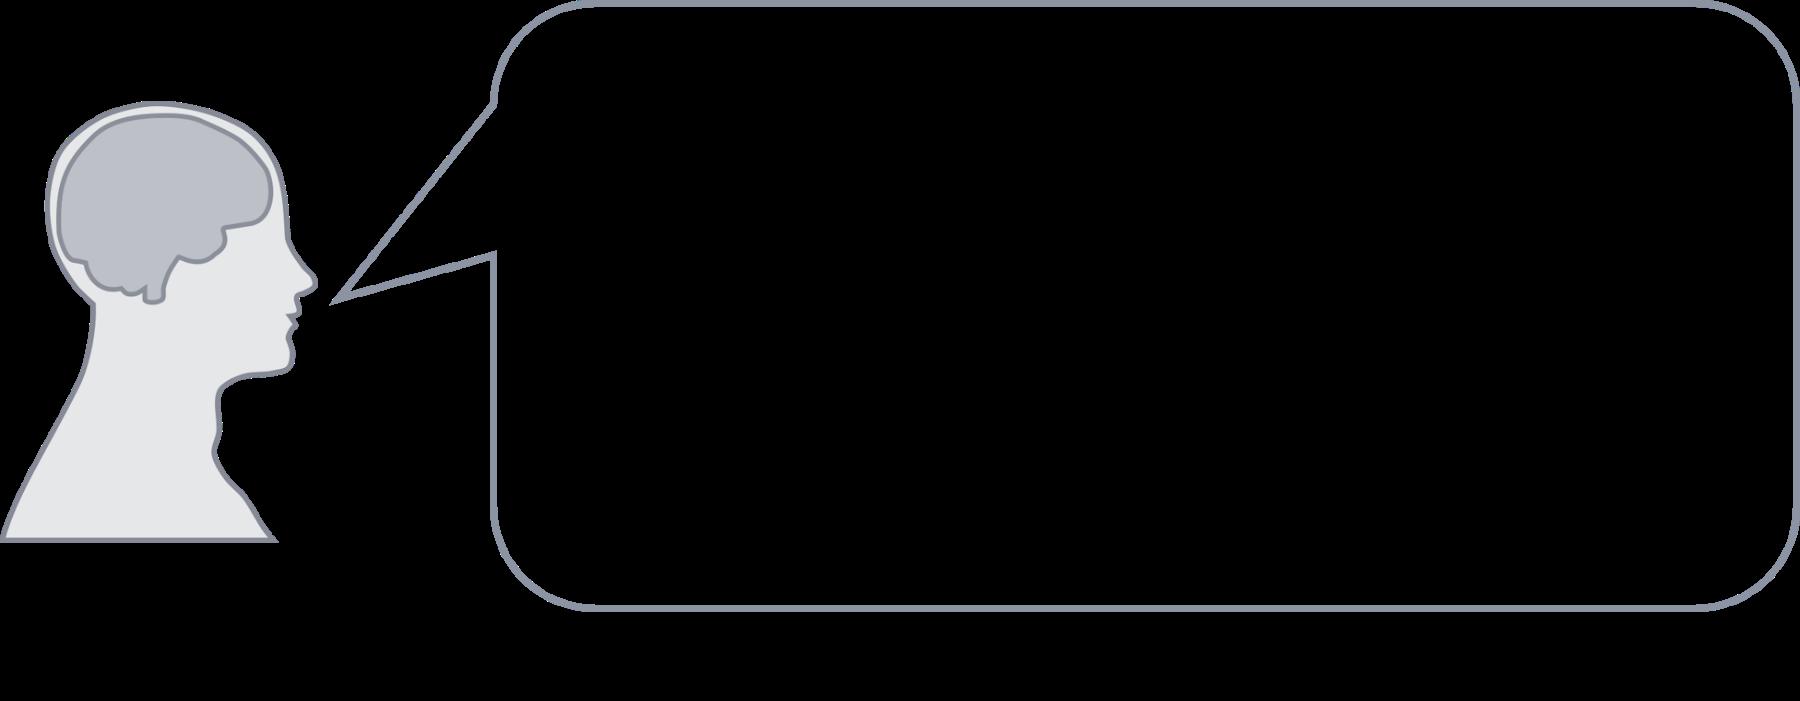 oxytocinquote1800.png